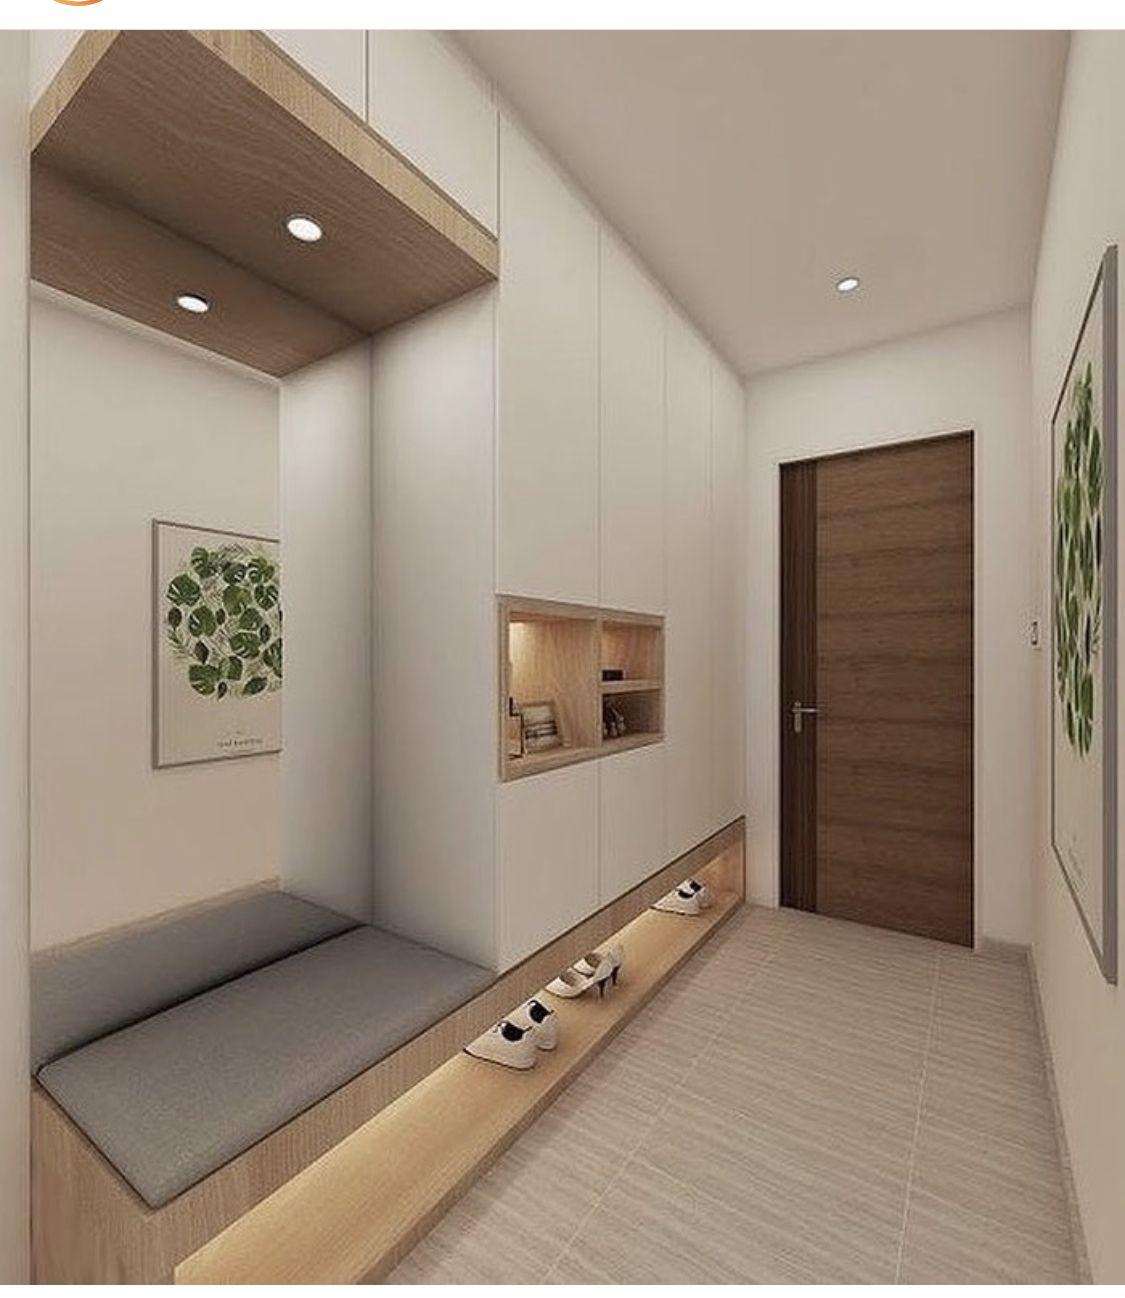 Pin By Hsin On Dizajn Kvartiry Apartment Decorating Rental Home Interior Design Hallway Designs